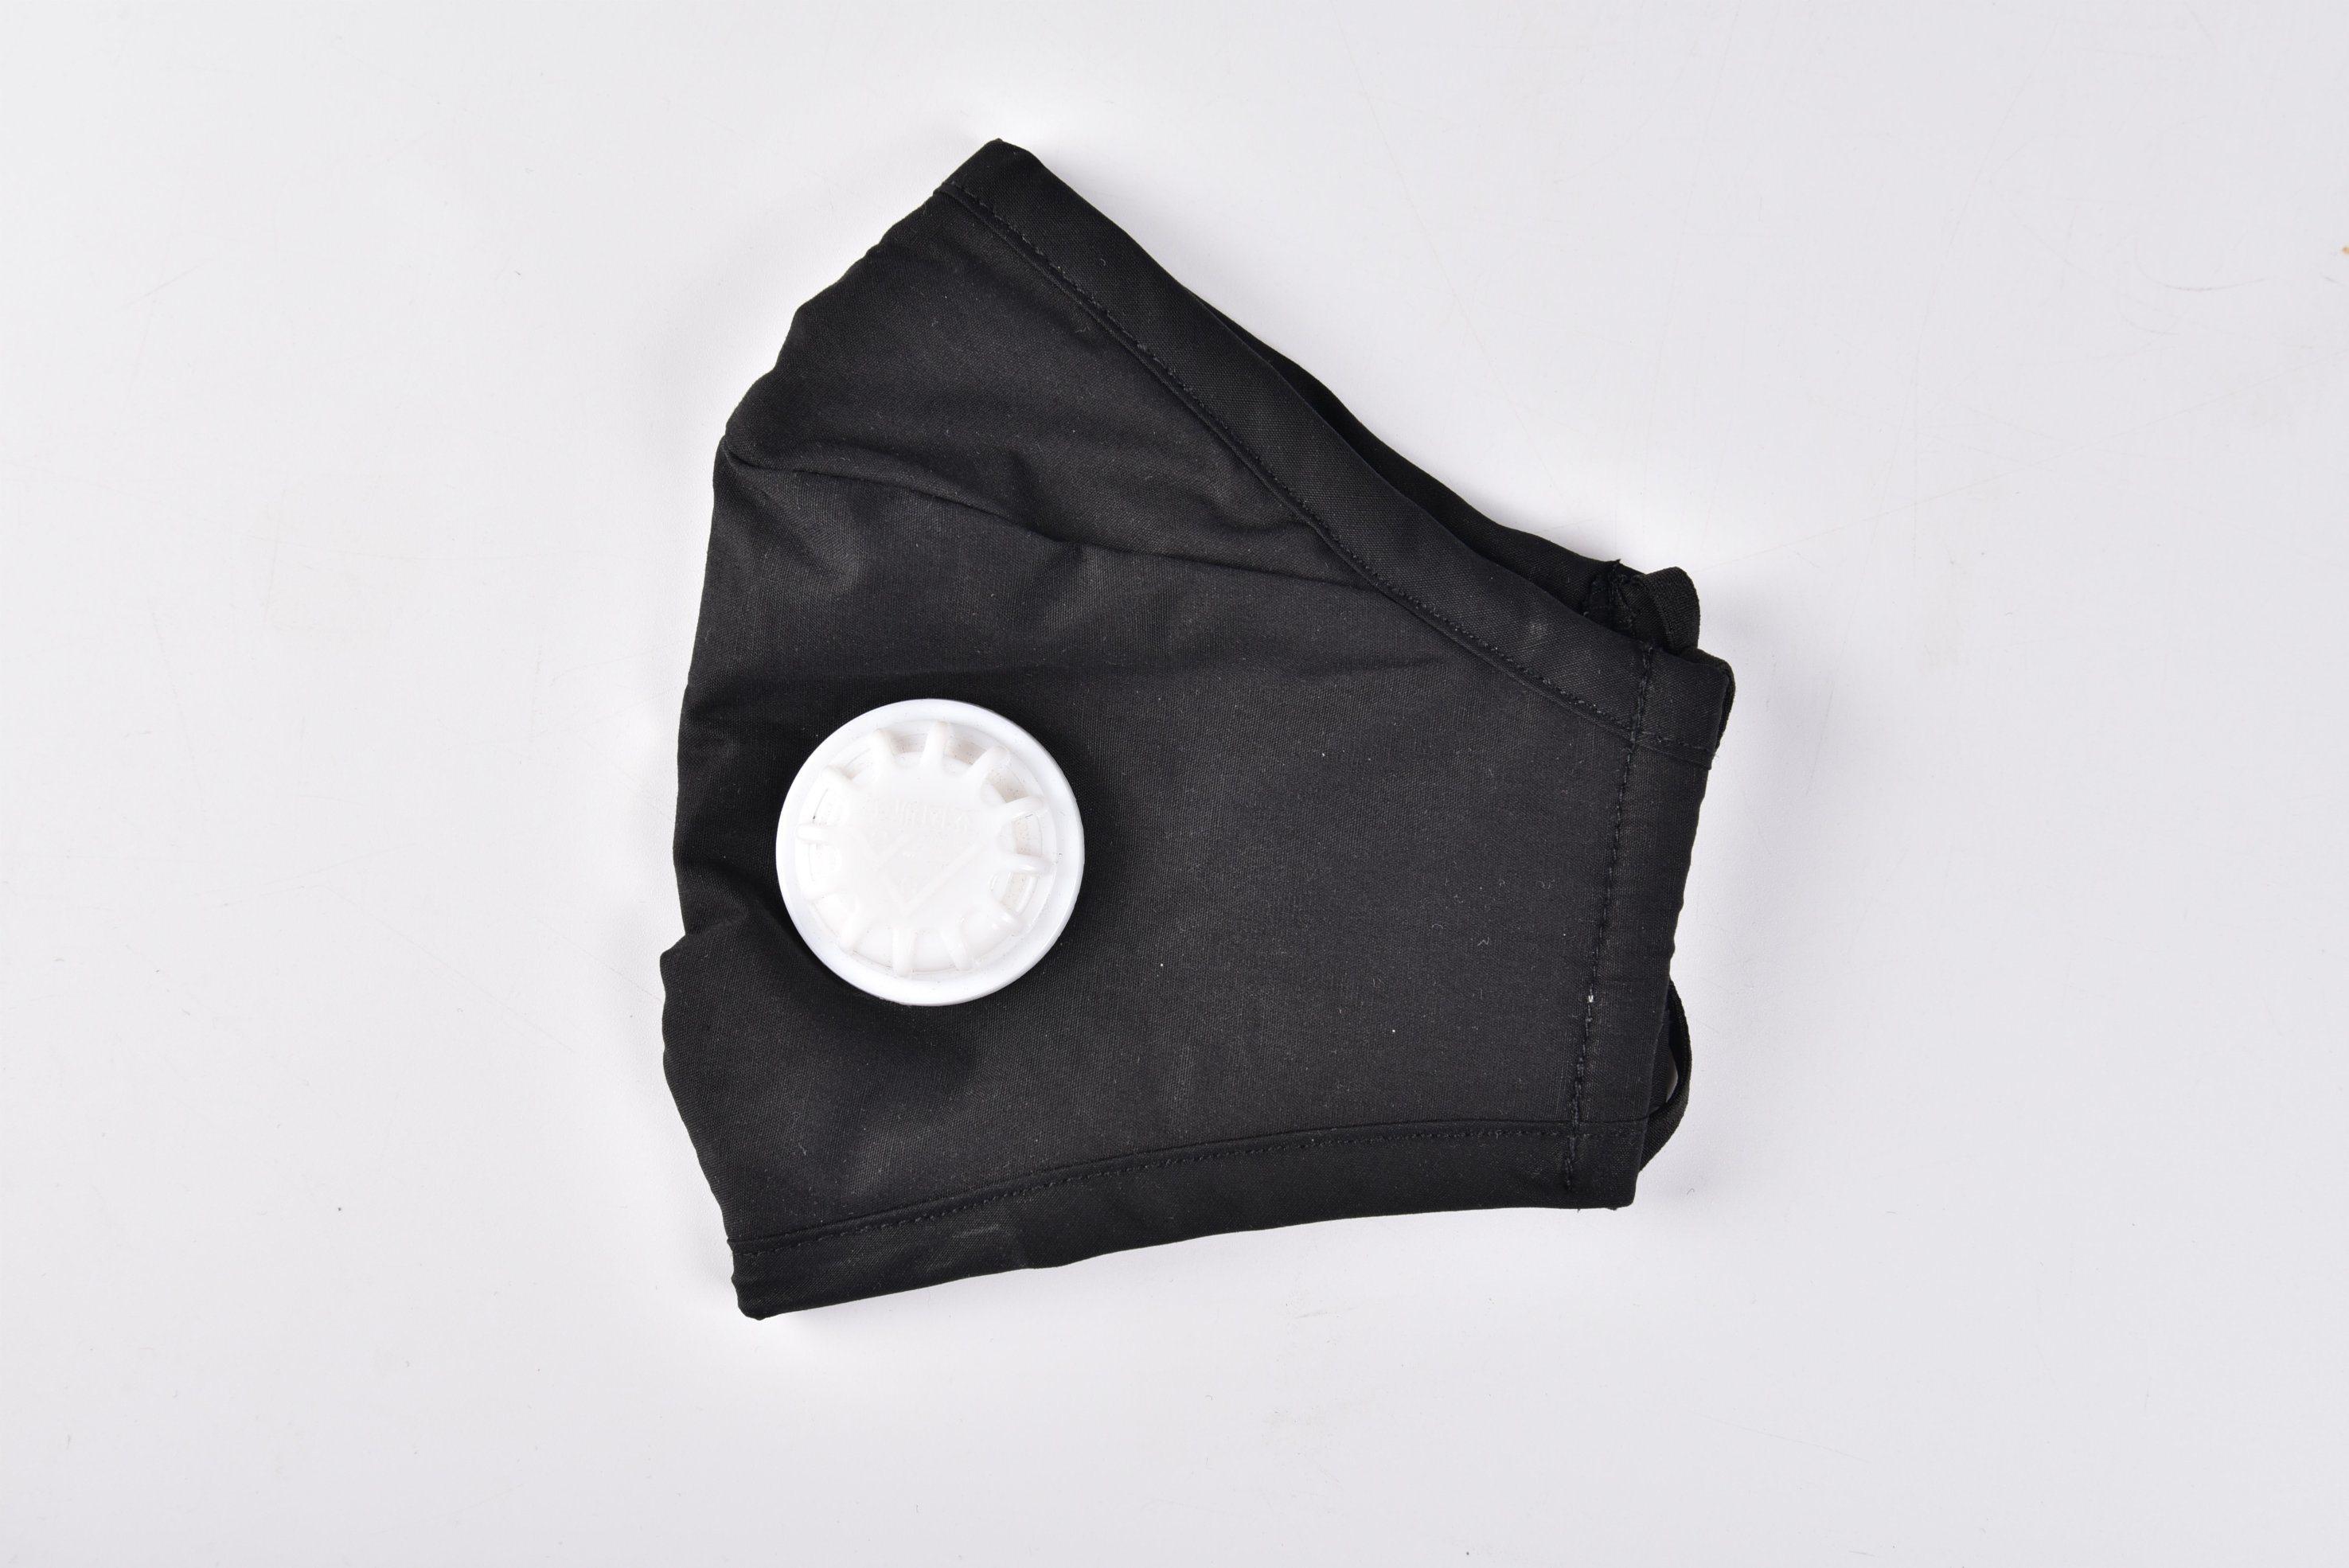 High Quatlity Washable Human Face Mask